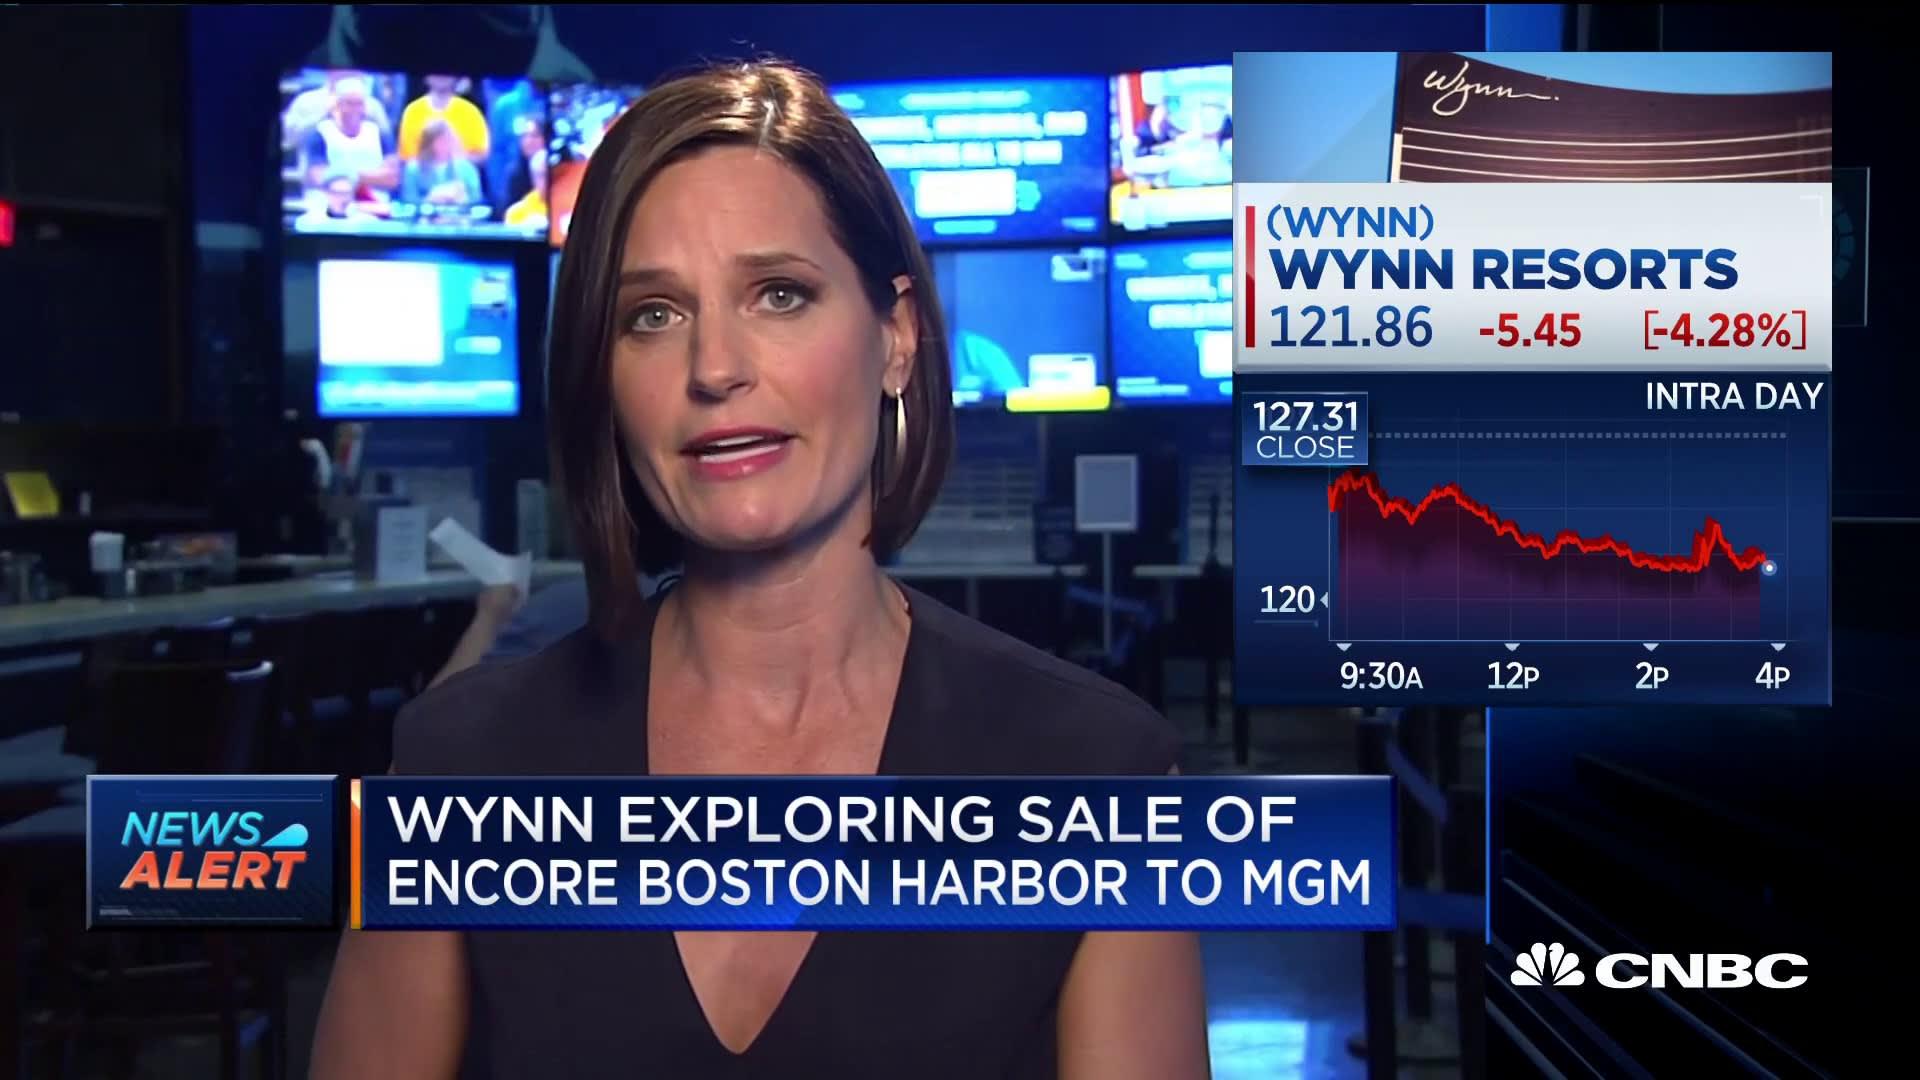 Wynn exploring sale of Encore Boston Harbor to MGM